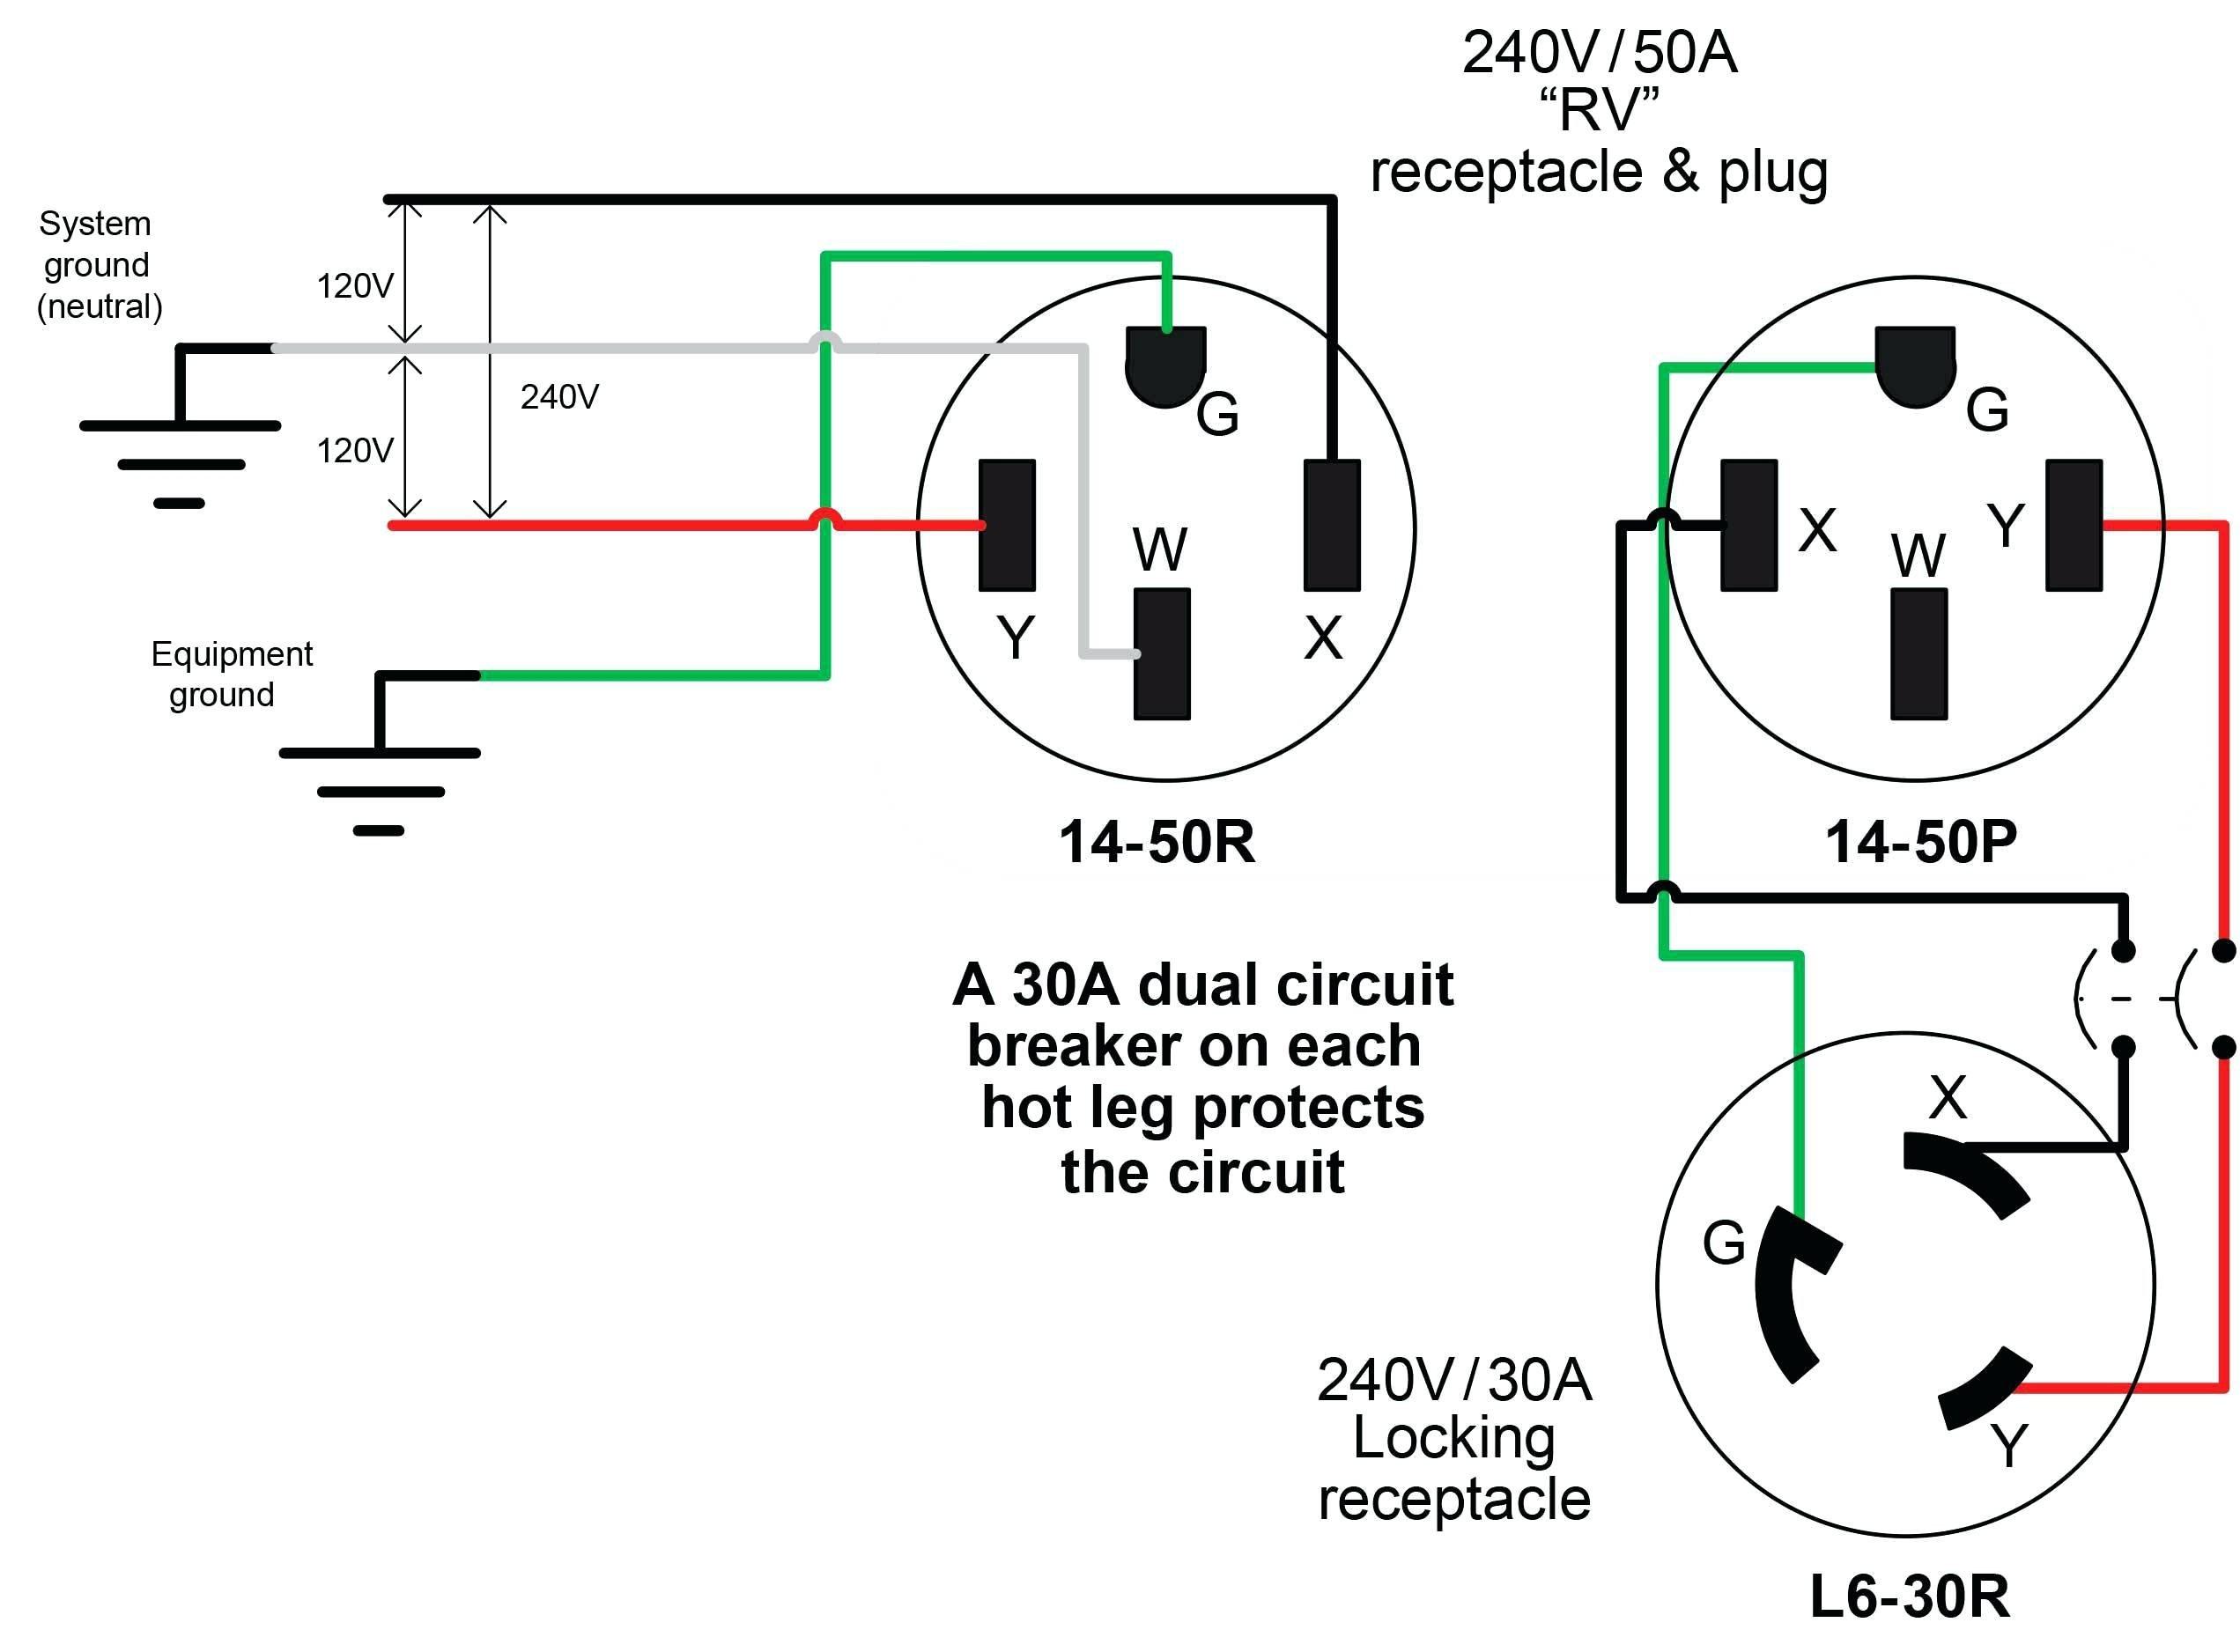 [DIAGRAM] Nema L6 30p Wiring Diagram FULL Version HD